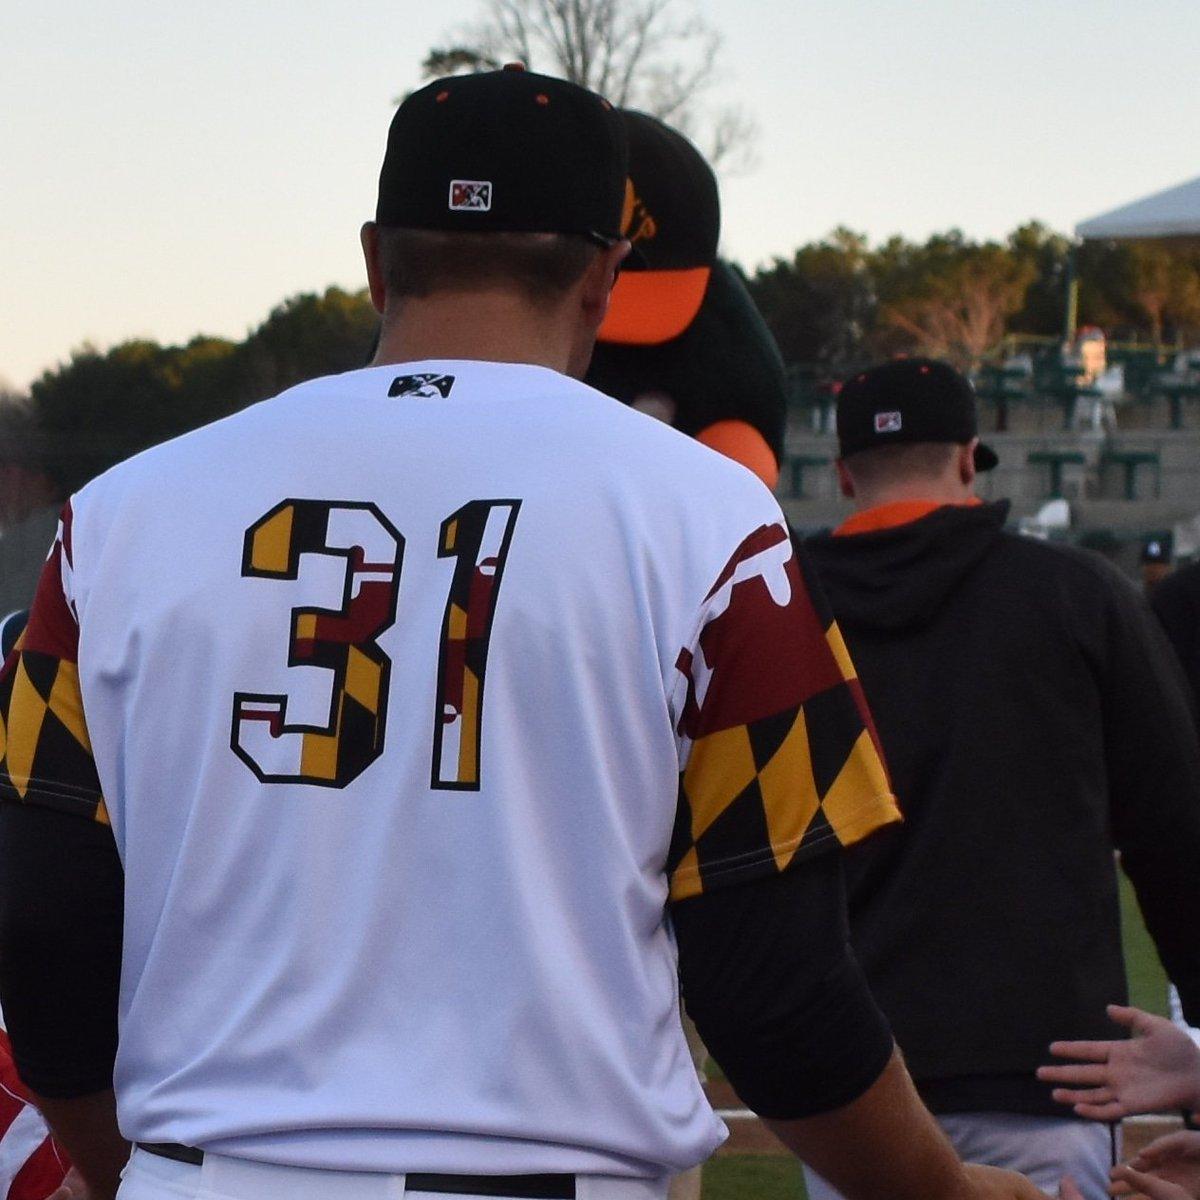 The Delmarva Shorebirds have Maryland-flag inspired jerseys ... 9f130e874f4